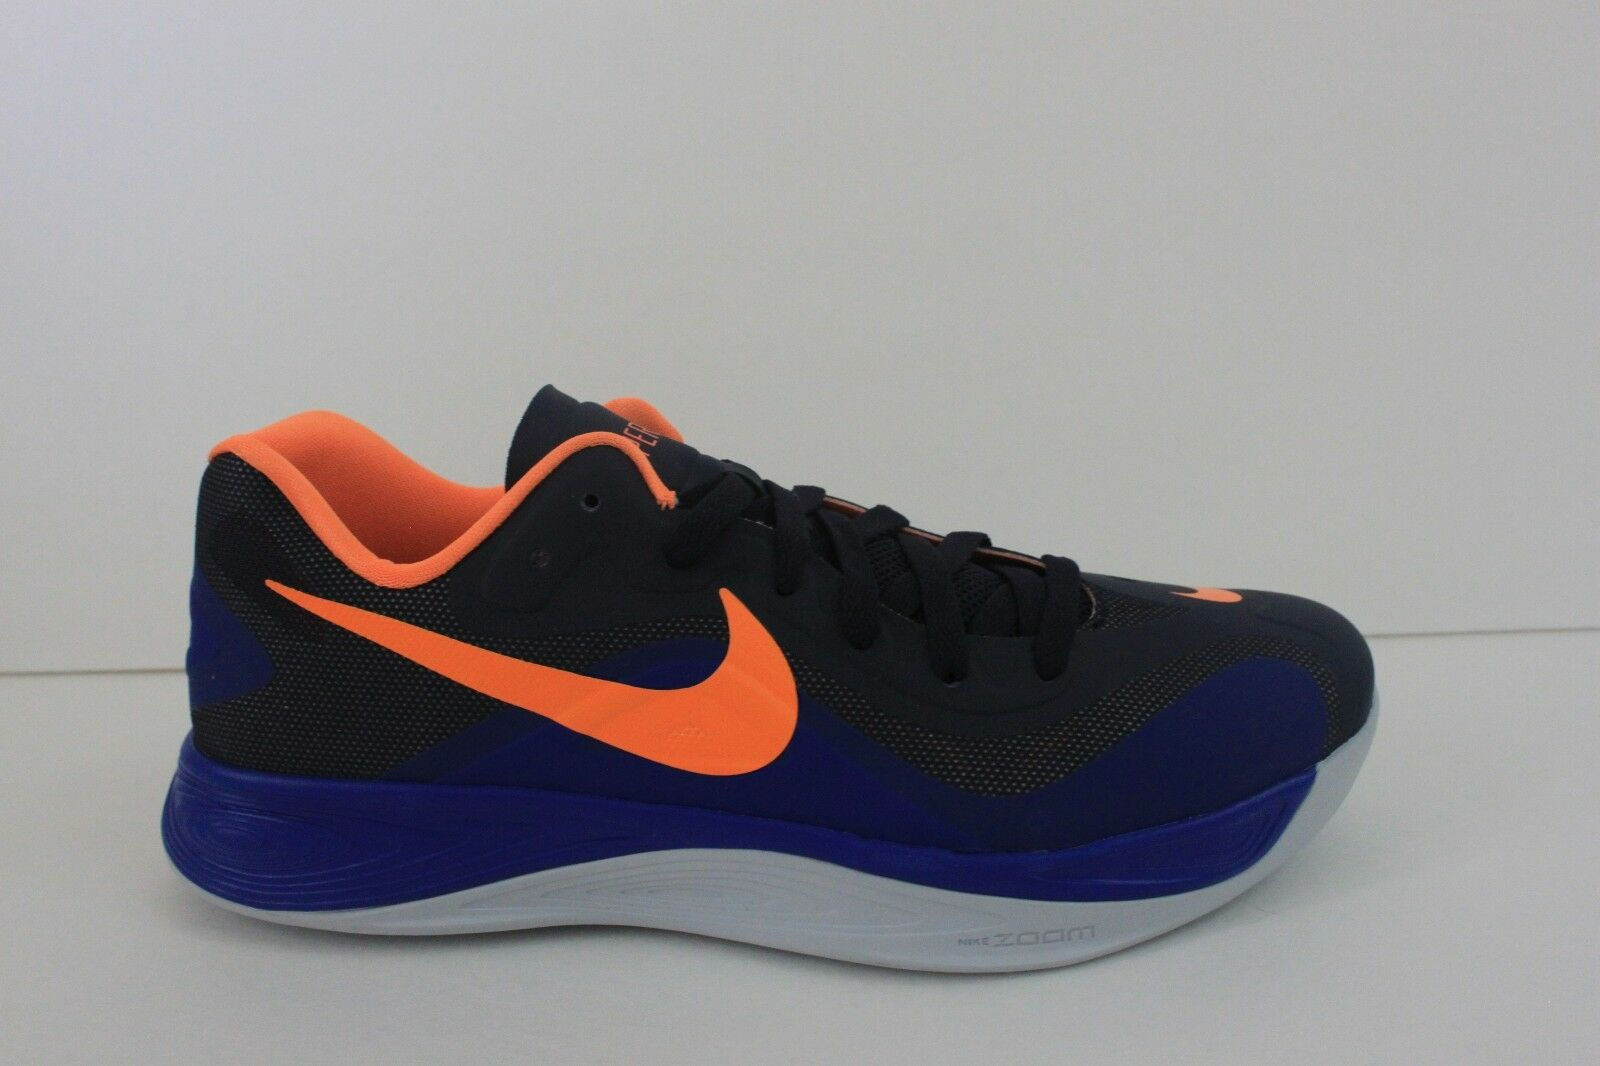 Nike Hyperfuse Shoe Size 10.5 M Men's Blue Basketball Athletic Sneaker NIB